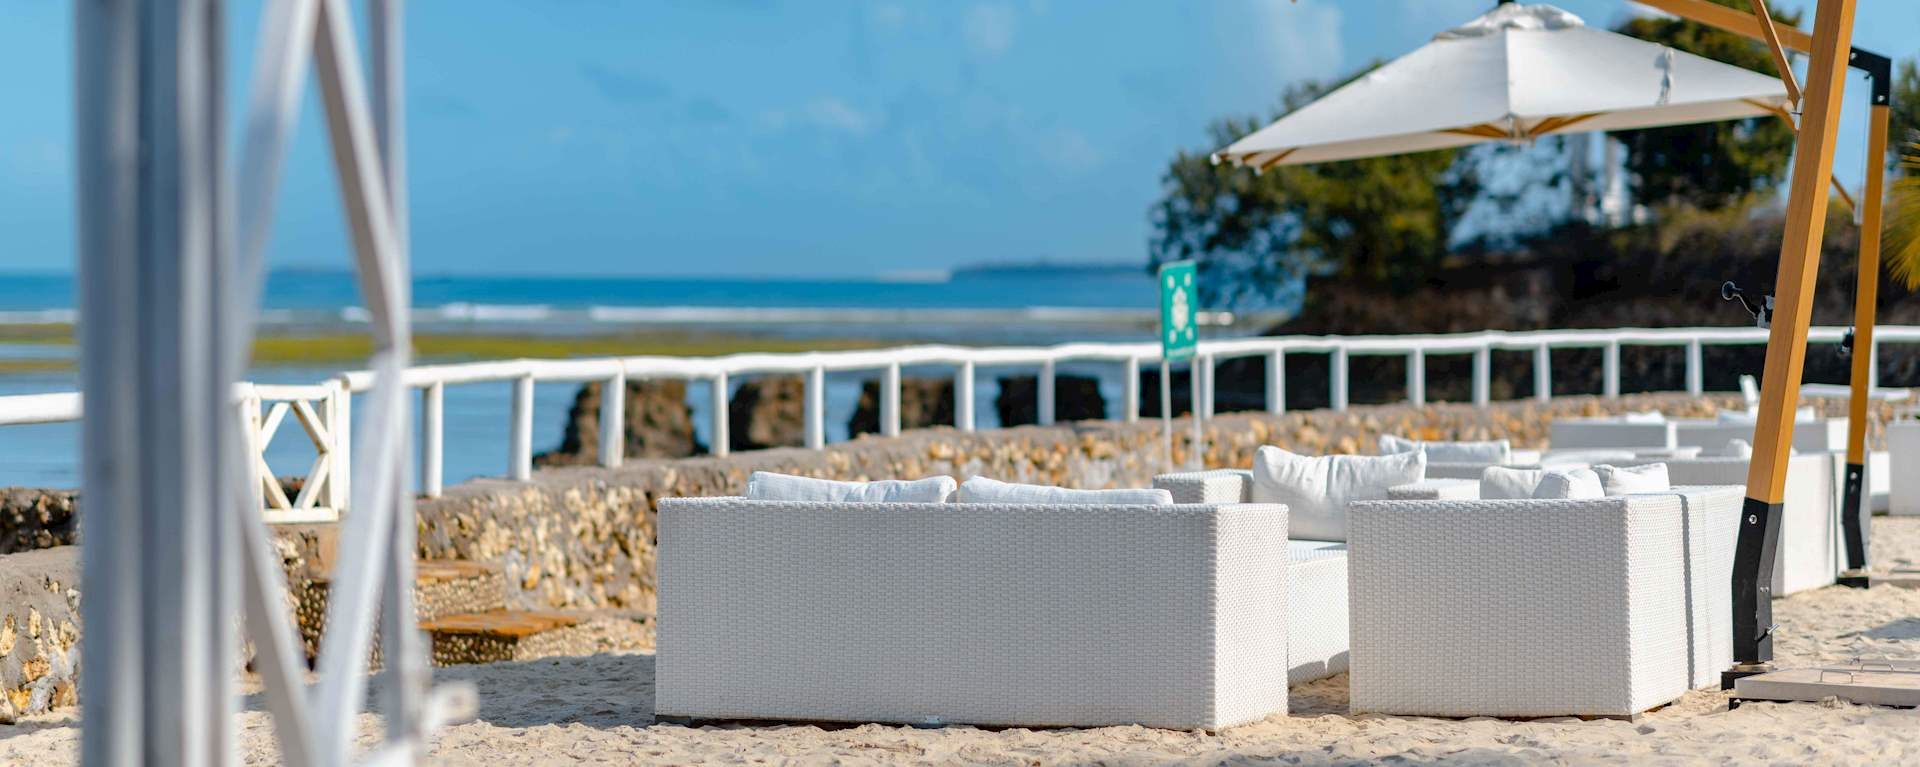 Best Western Coral Beach Hotel13